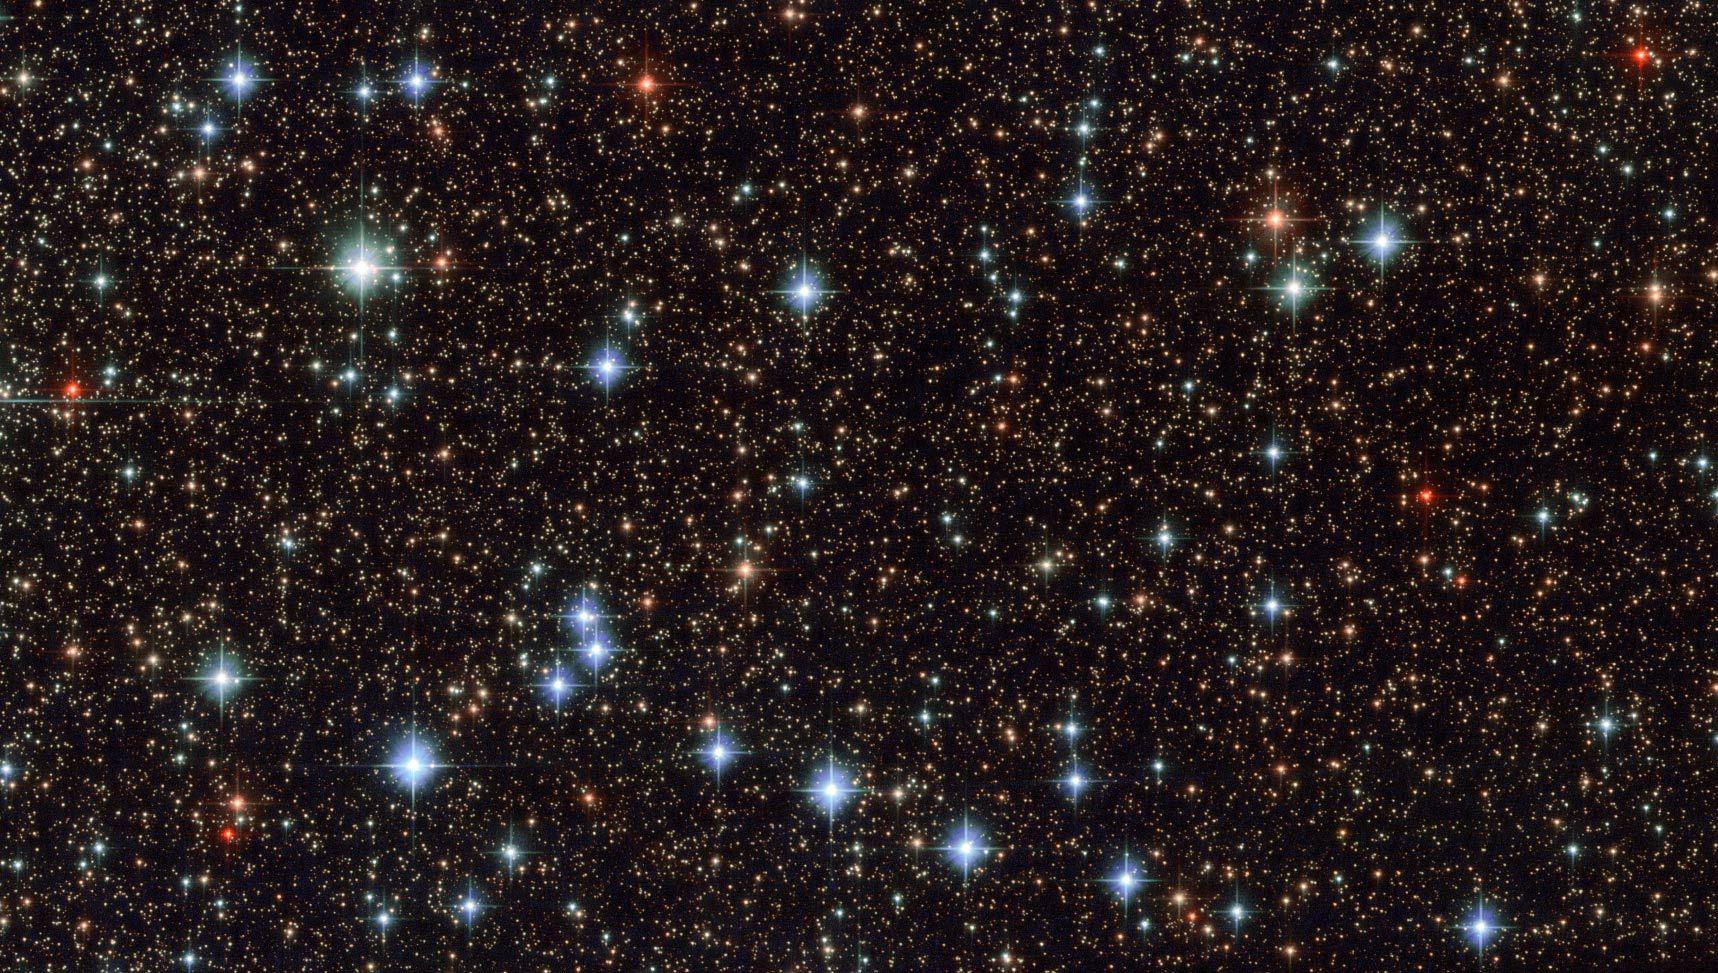 Hvězdné pole. Foto: ESA/NASA/Hubble.